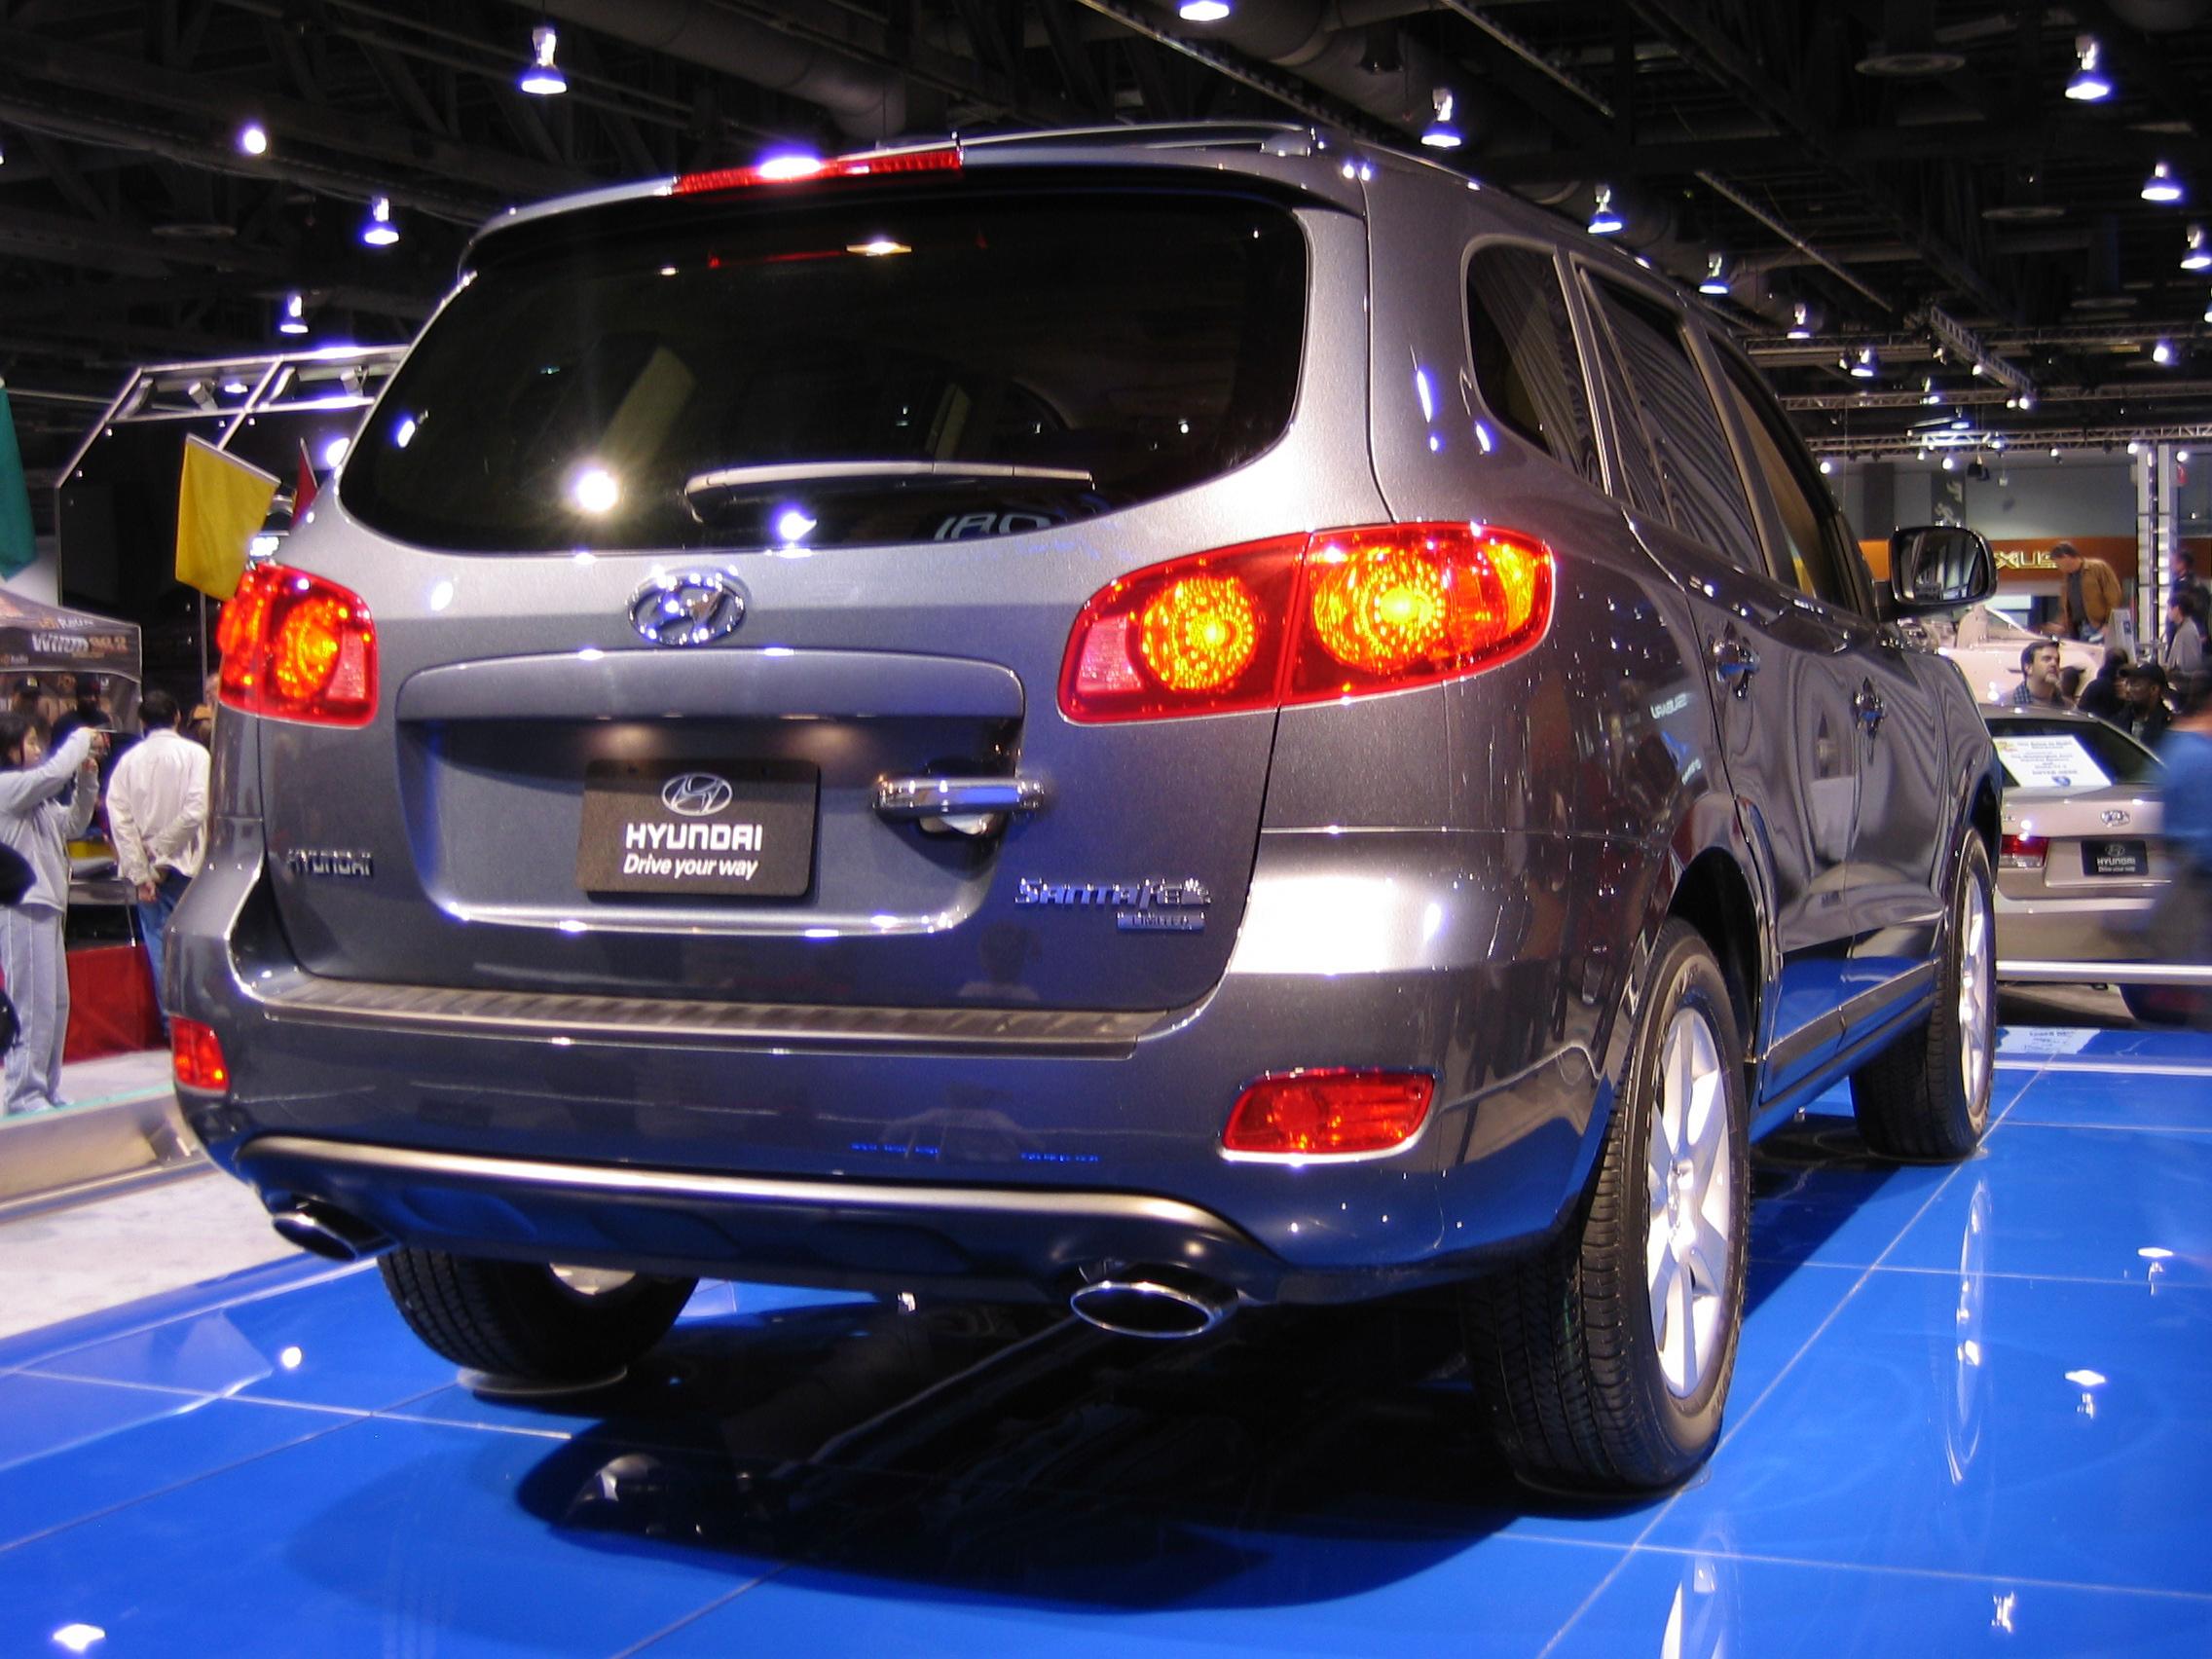 File Hyundai Santafe 2007washauto Jpg Wikimedia Commons